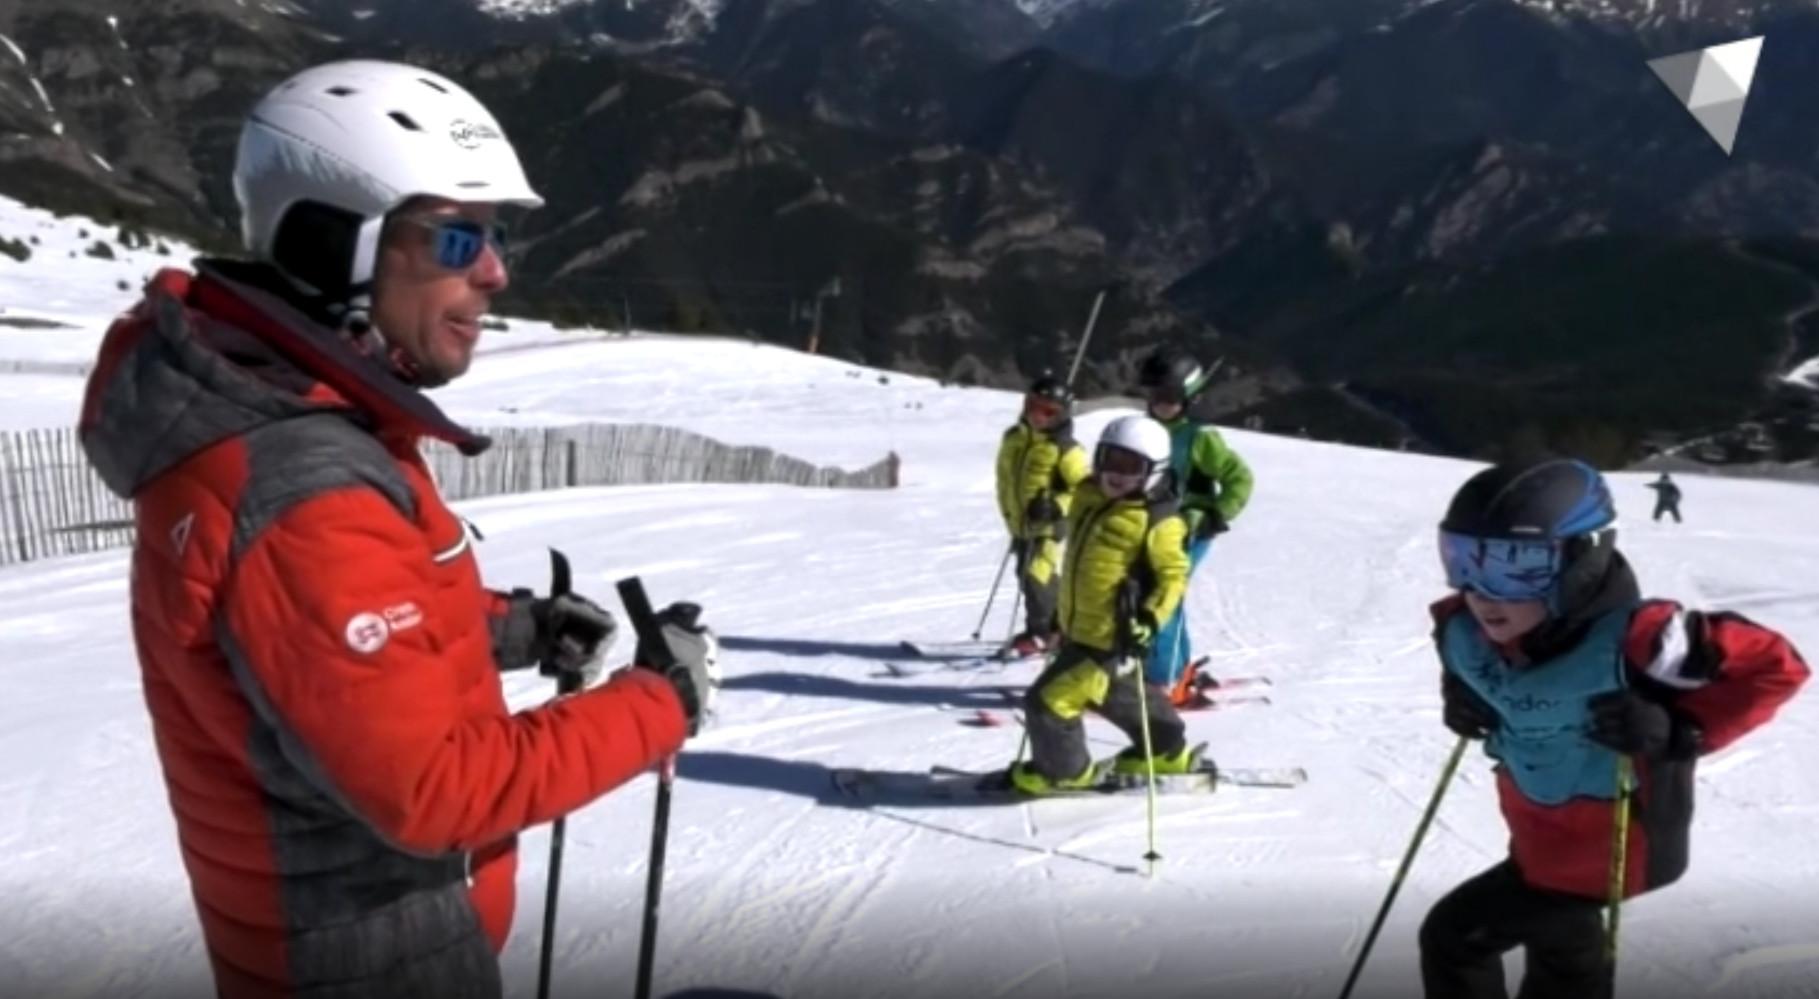 Espai Neu - Snowplus, un club d'esquí no competitiu